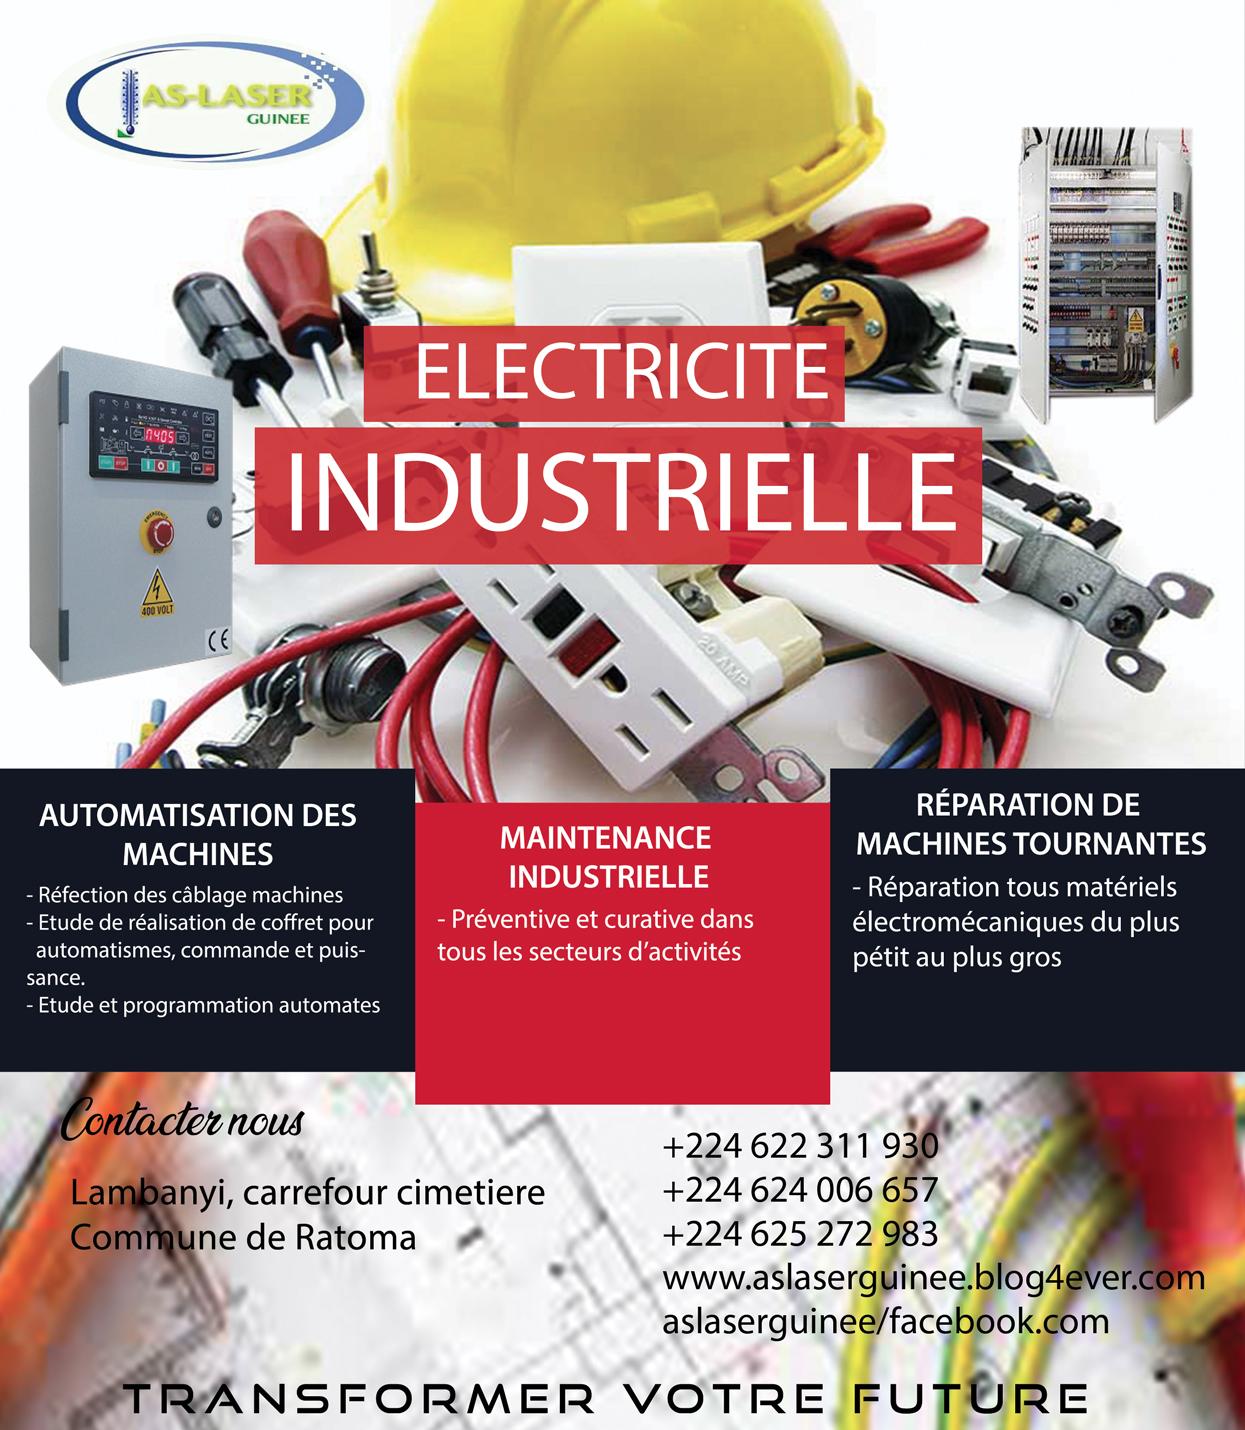 AS-laser-Affiche-electricite-industrielle.jpg